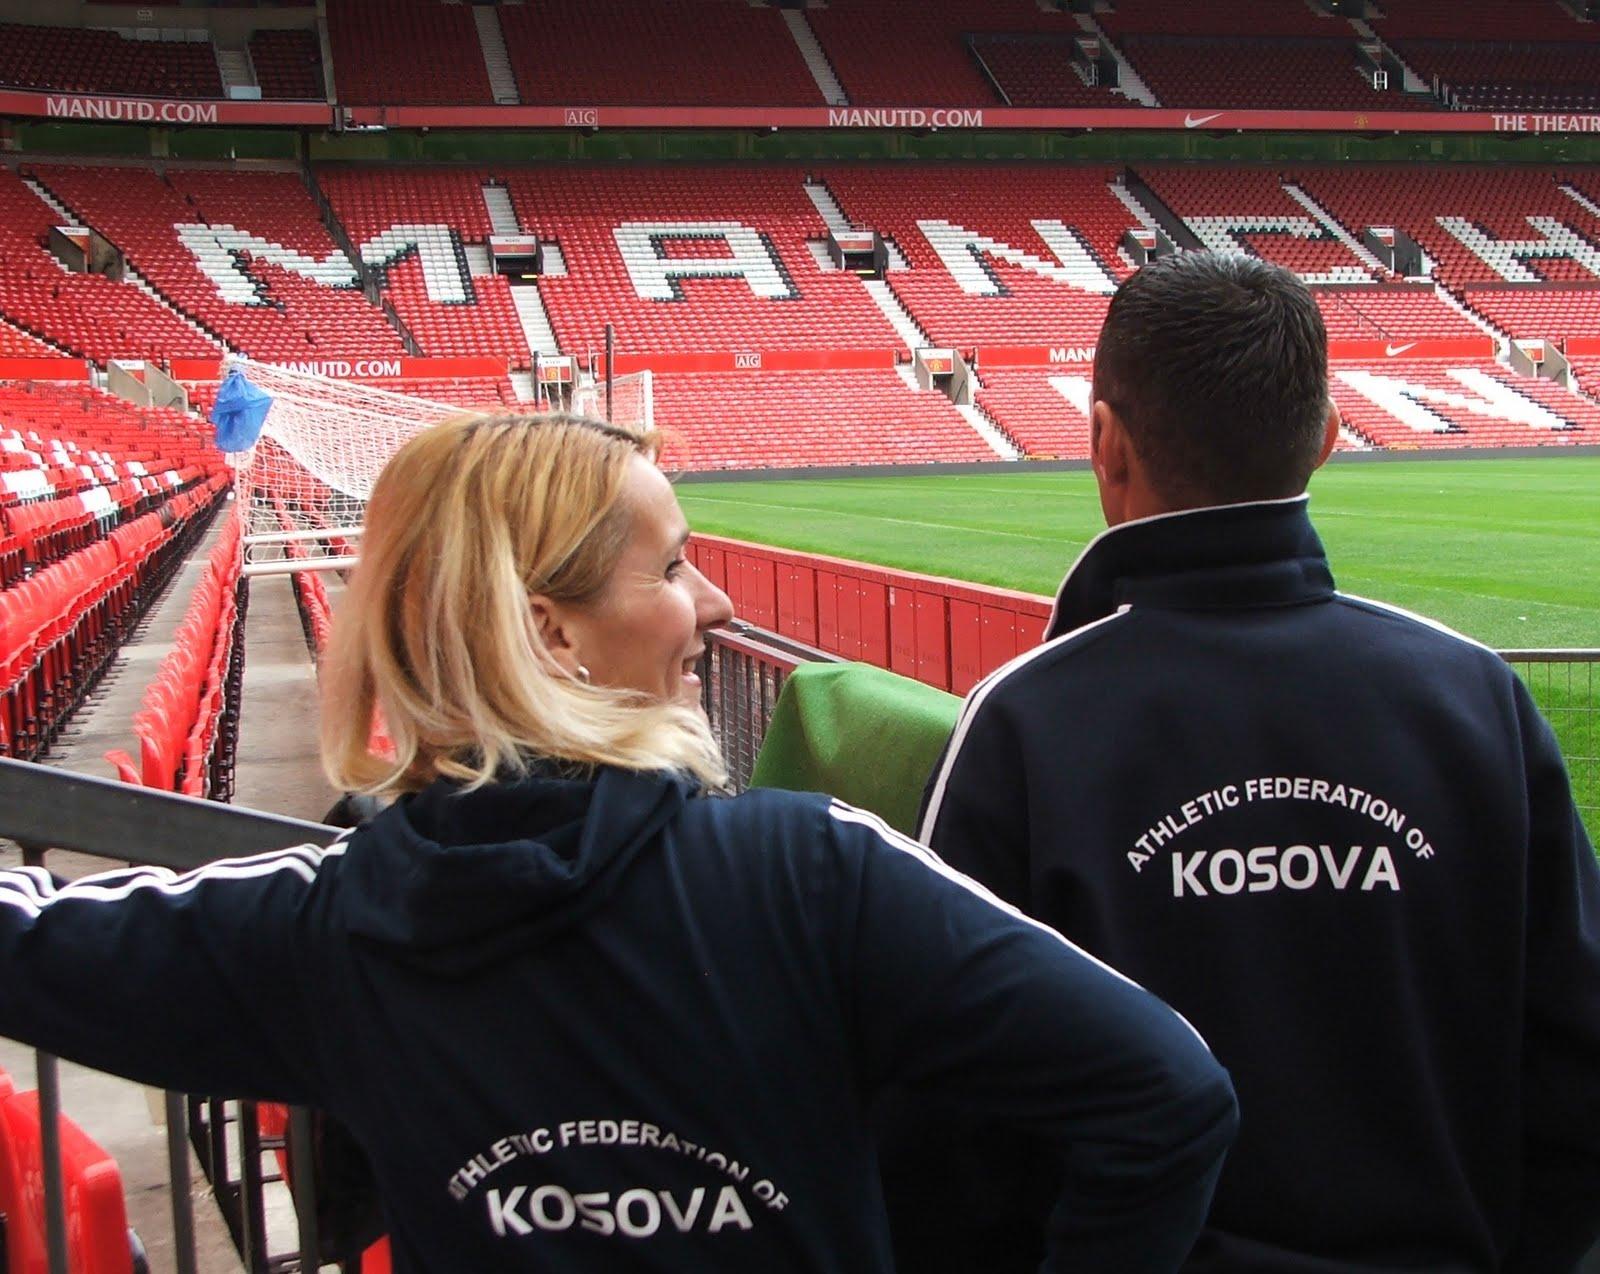 Kosovan Athletes in Manchester, 20 May 2007